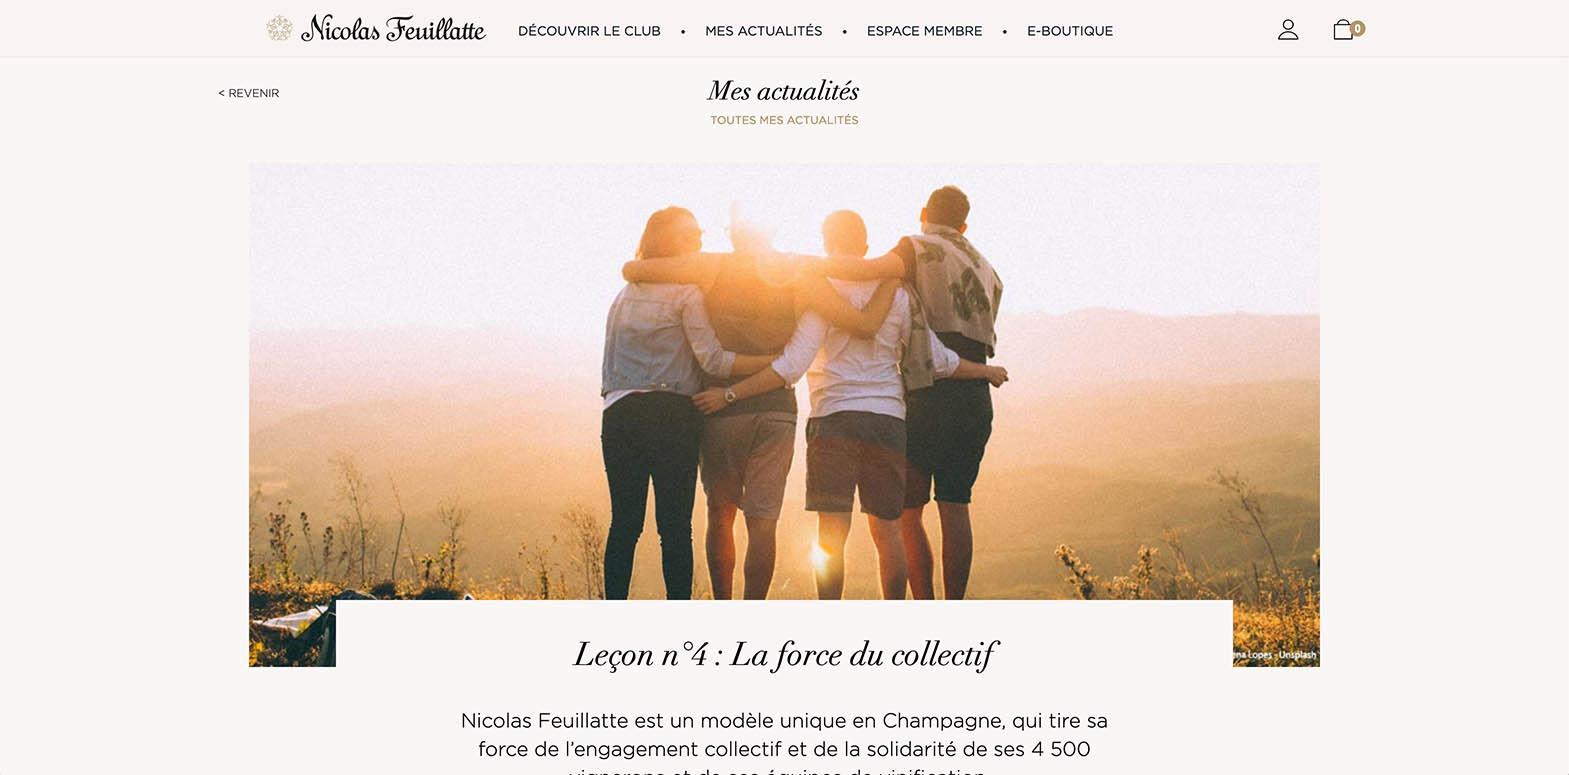 La force du collectif Nicolas Feuillatte - Agence Discovery